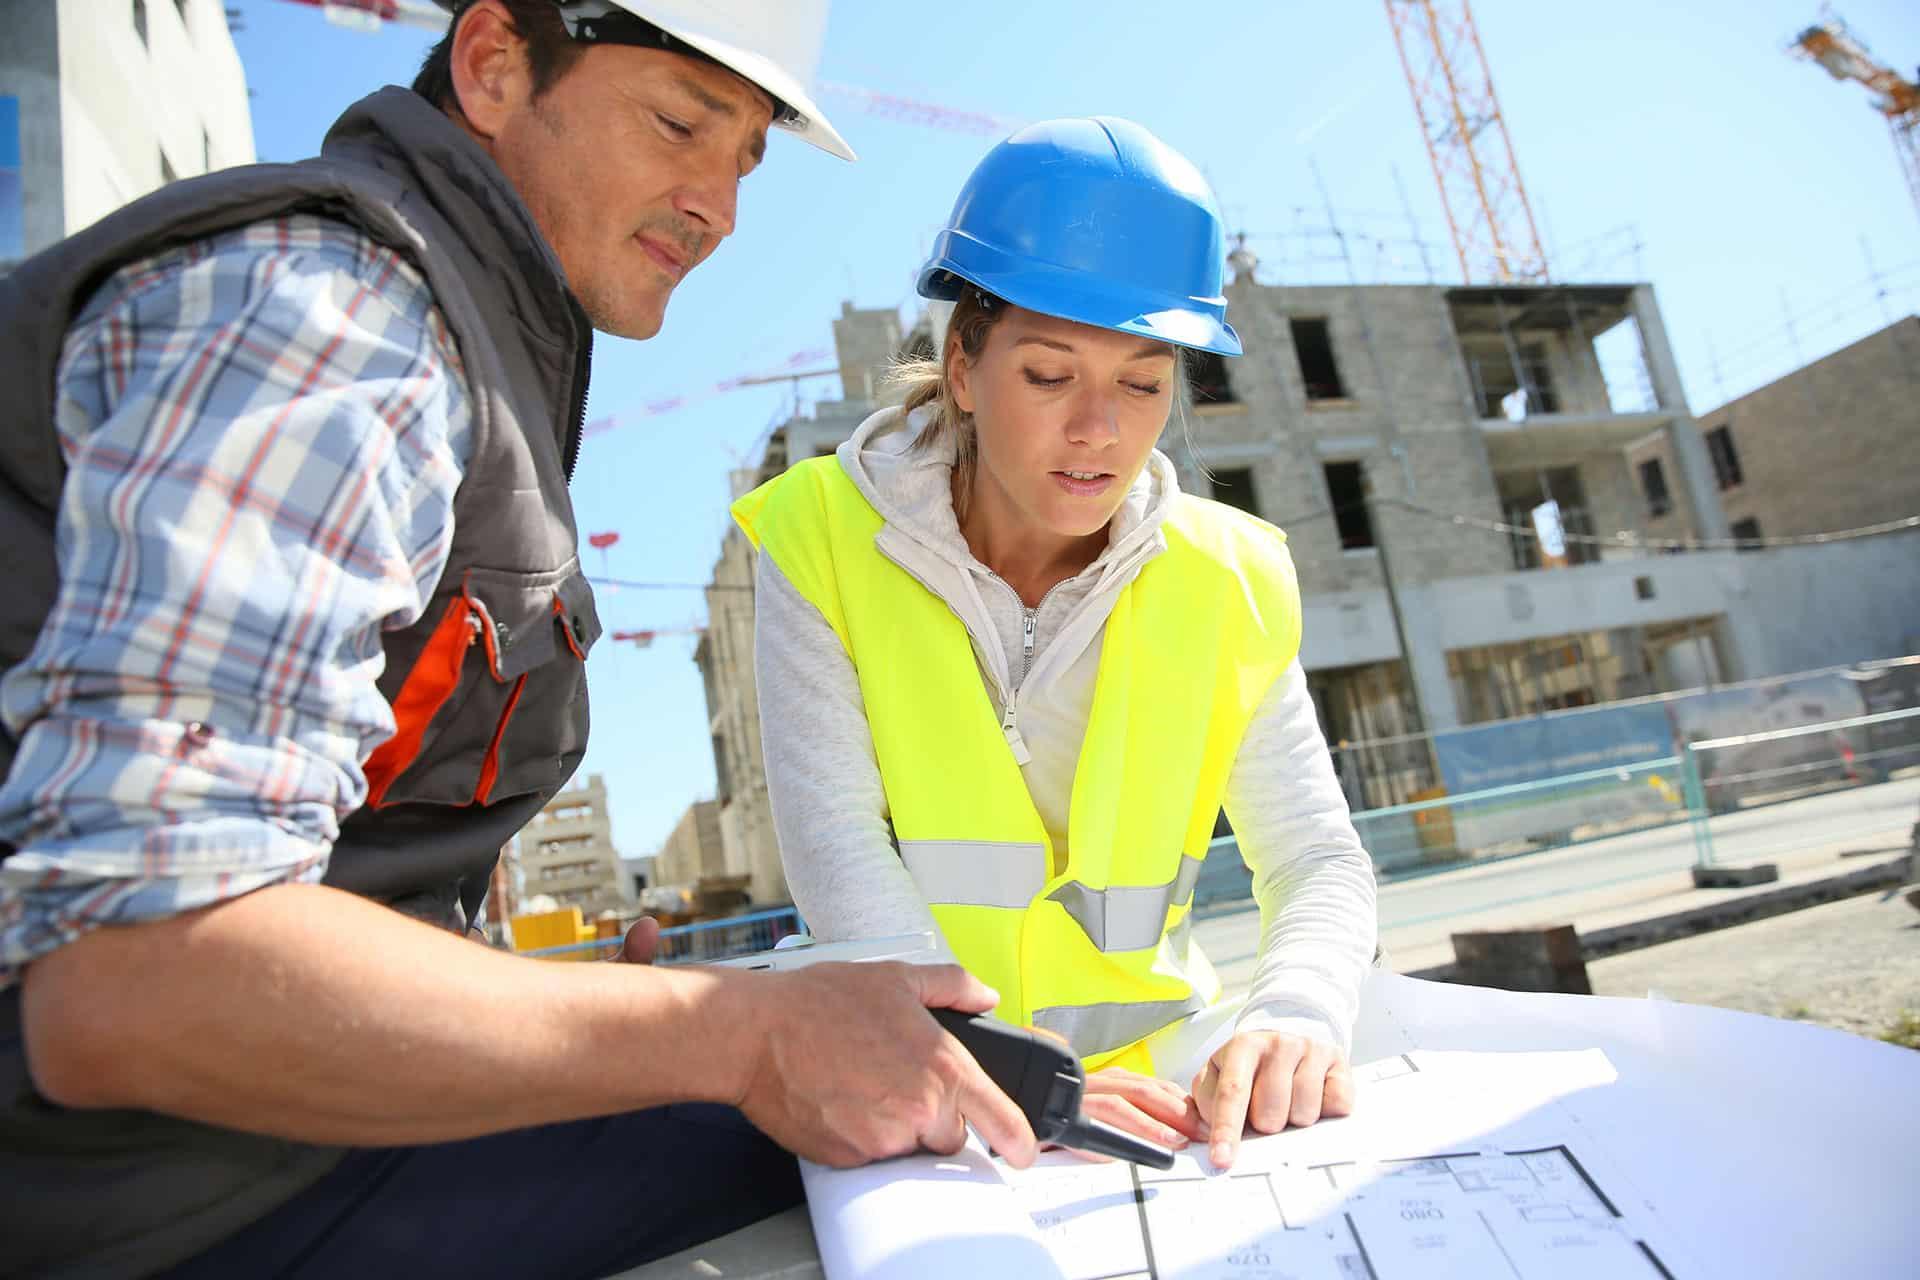 Site Supervisor Job Description 2021 Updates